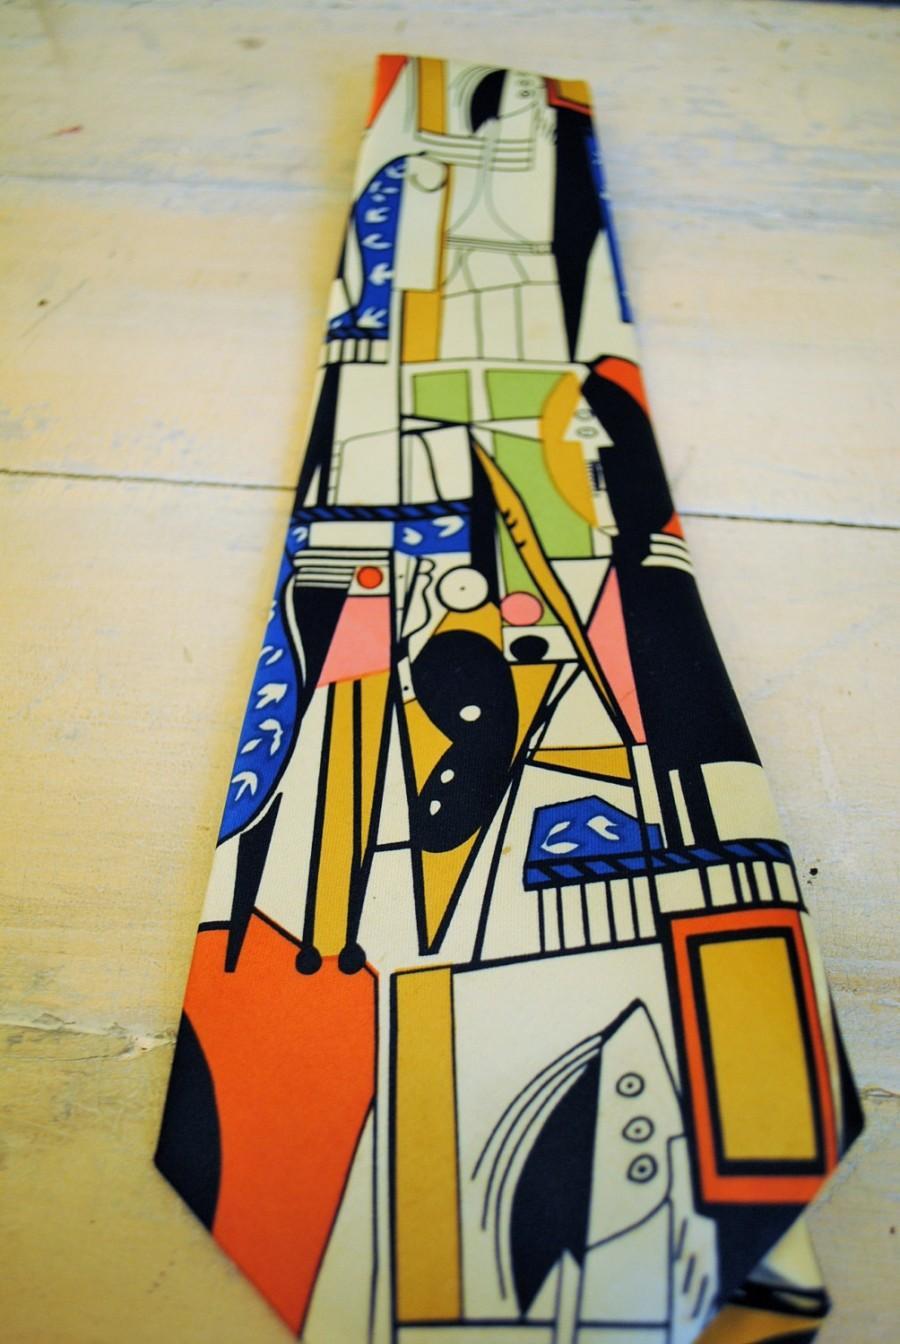 Mariage - Necktie 1960 Abstract tie modern mid-century great graphics wow Artists VINTAGE MENS TIE No2 Necktie antique vintage kitch cool retro man